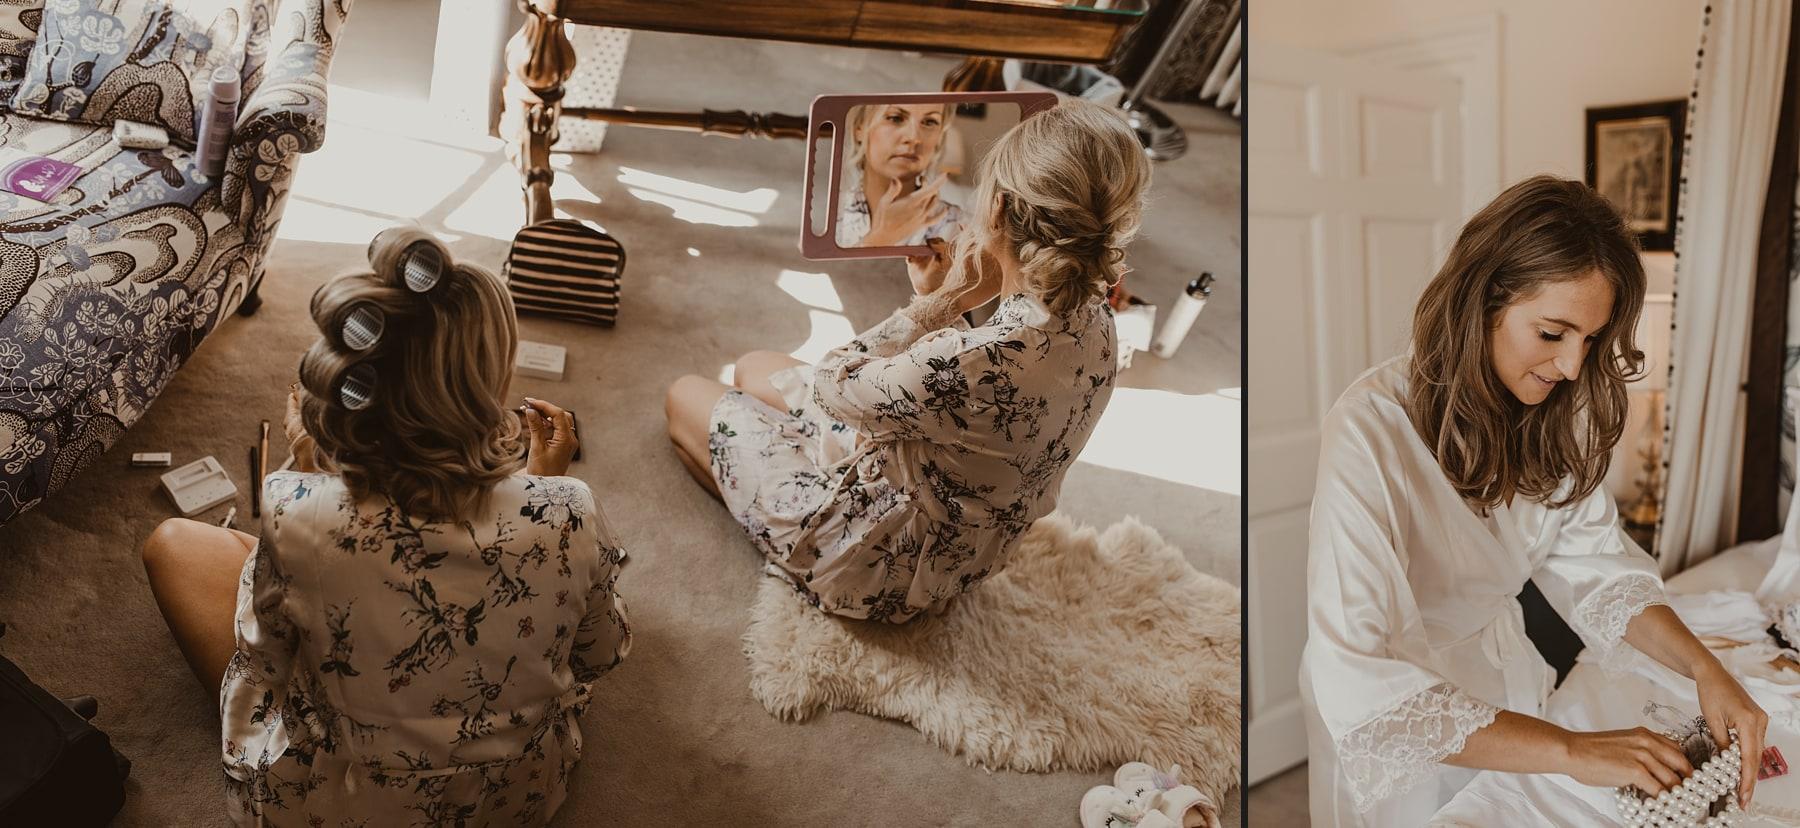 Bridesmaid applying make up in mirror